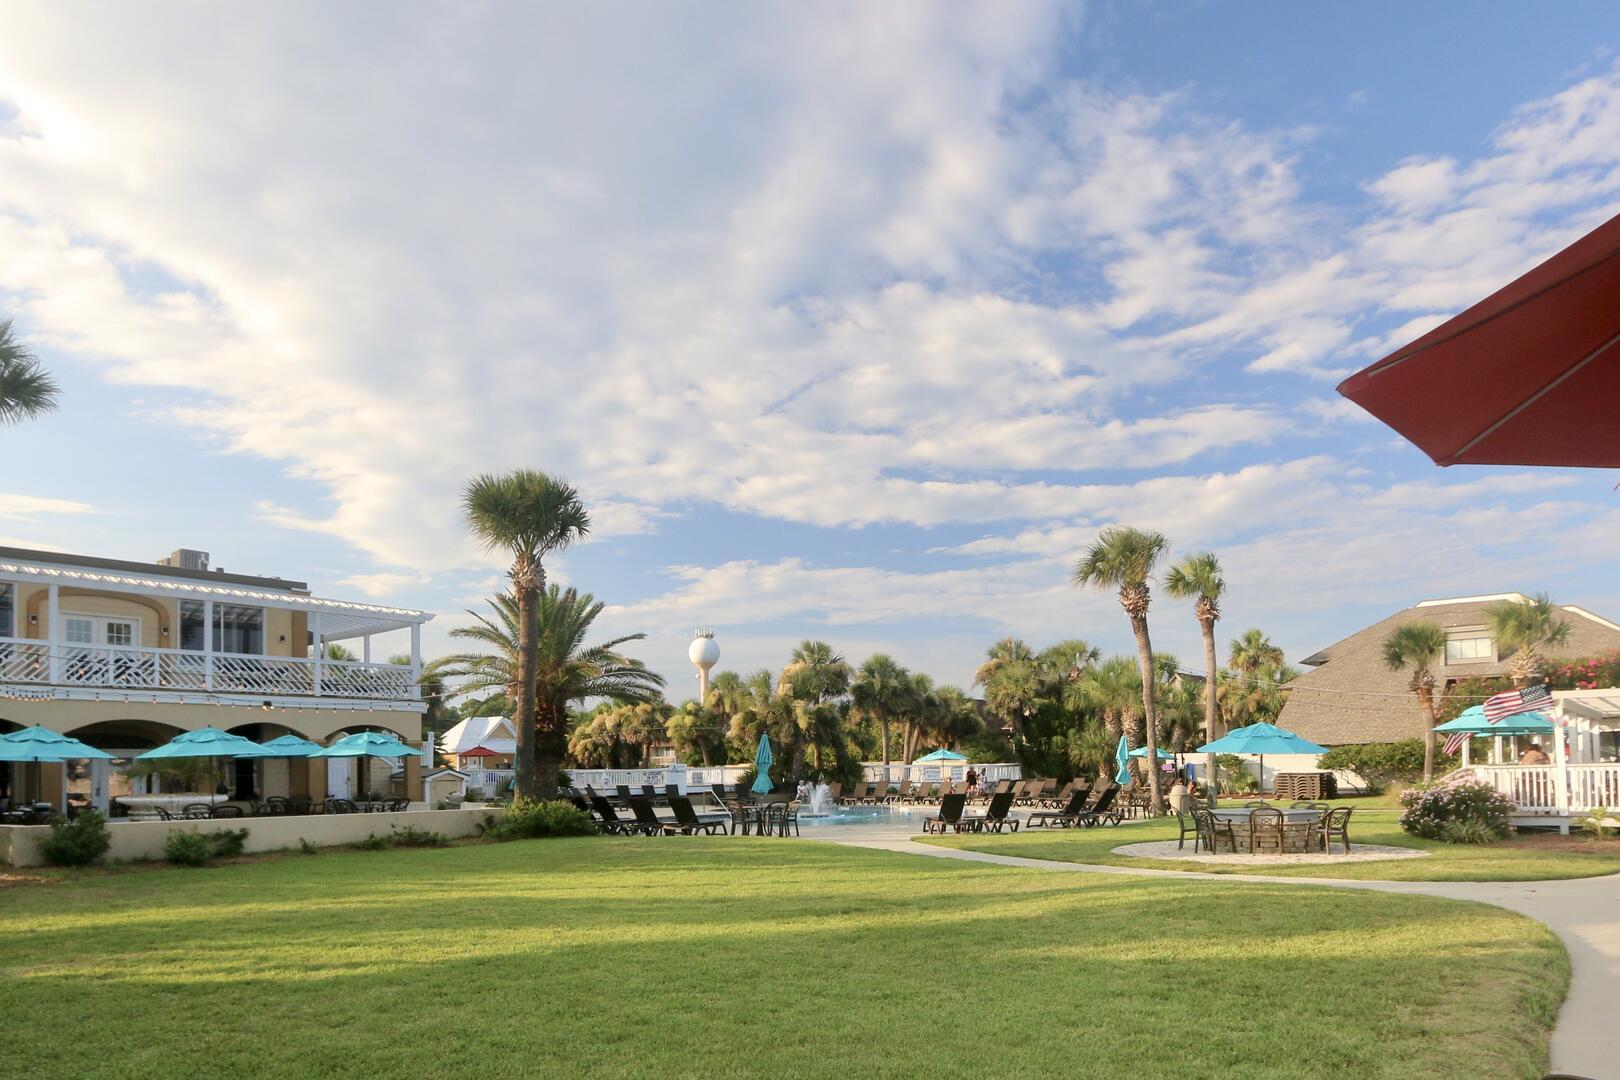 Adult Pool and Beach Club